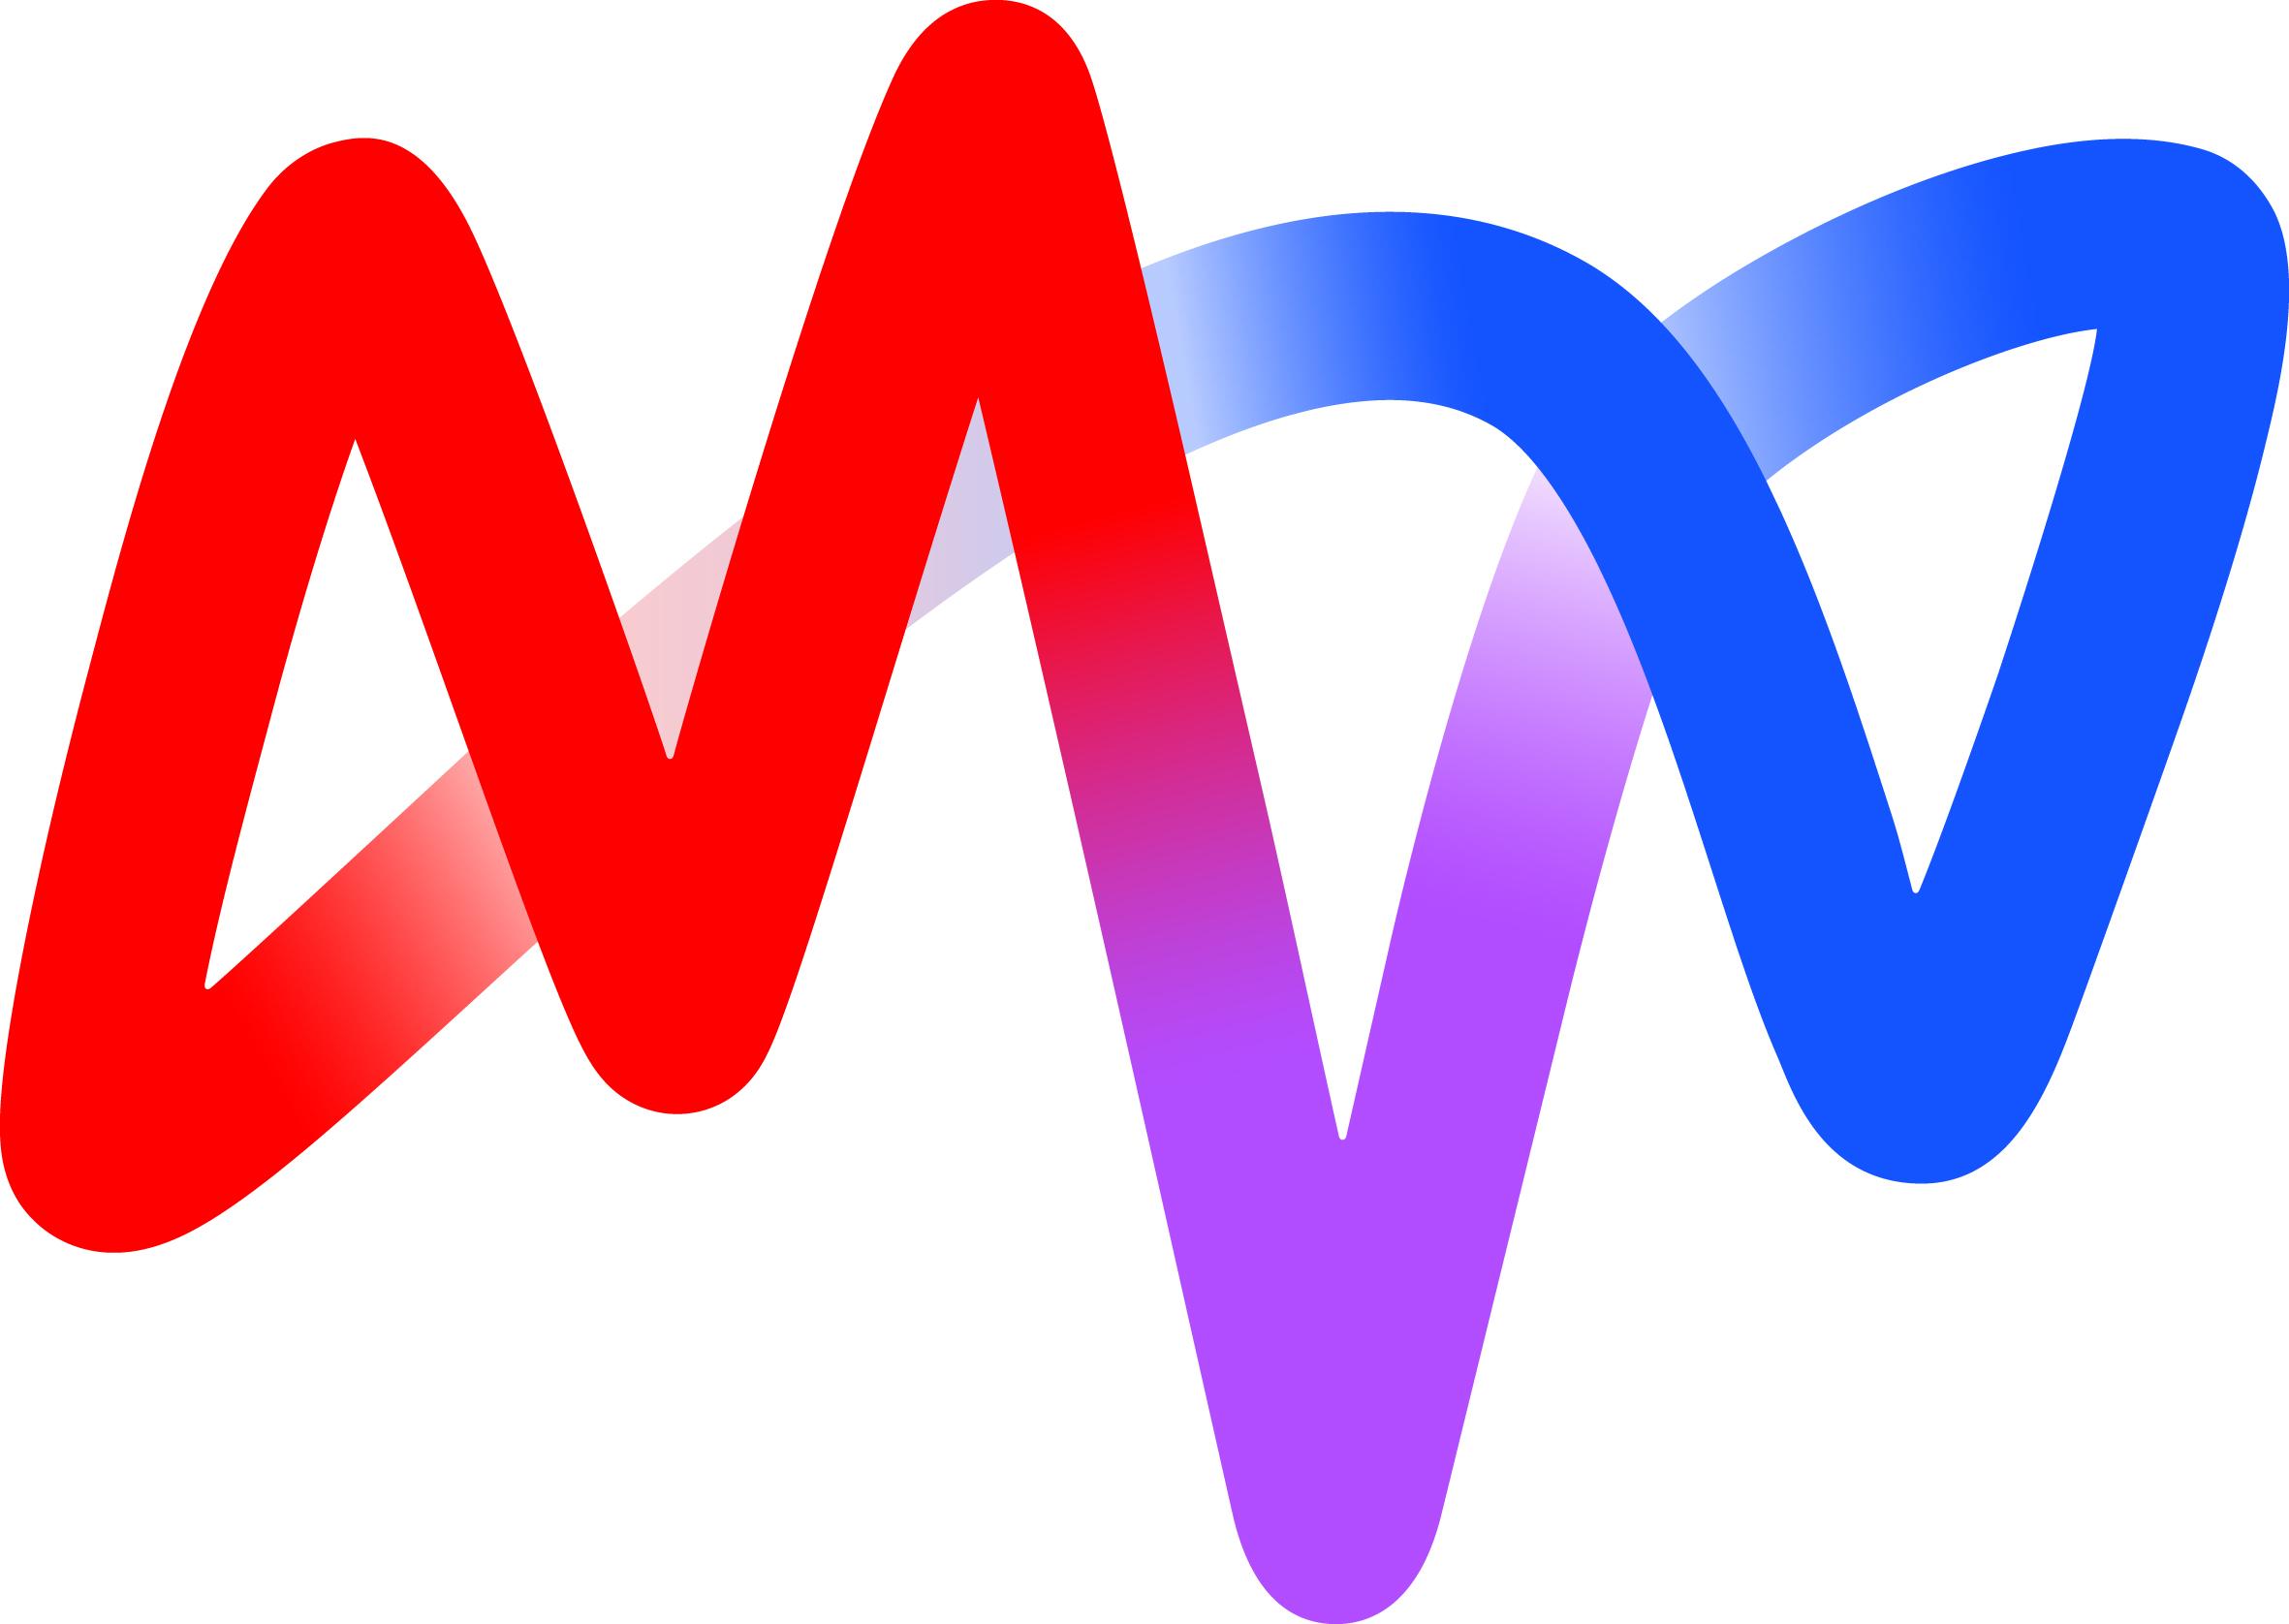 MVV Enamic IGS Gersthofen GmbH